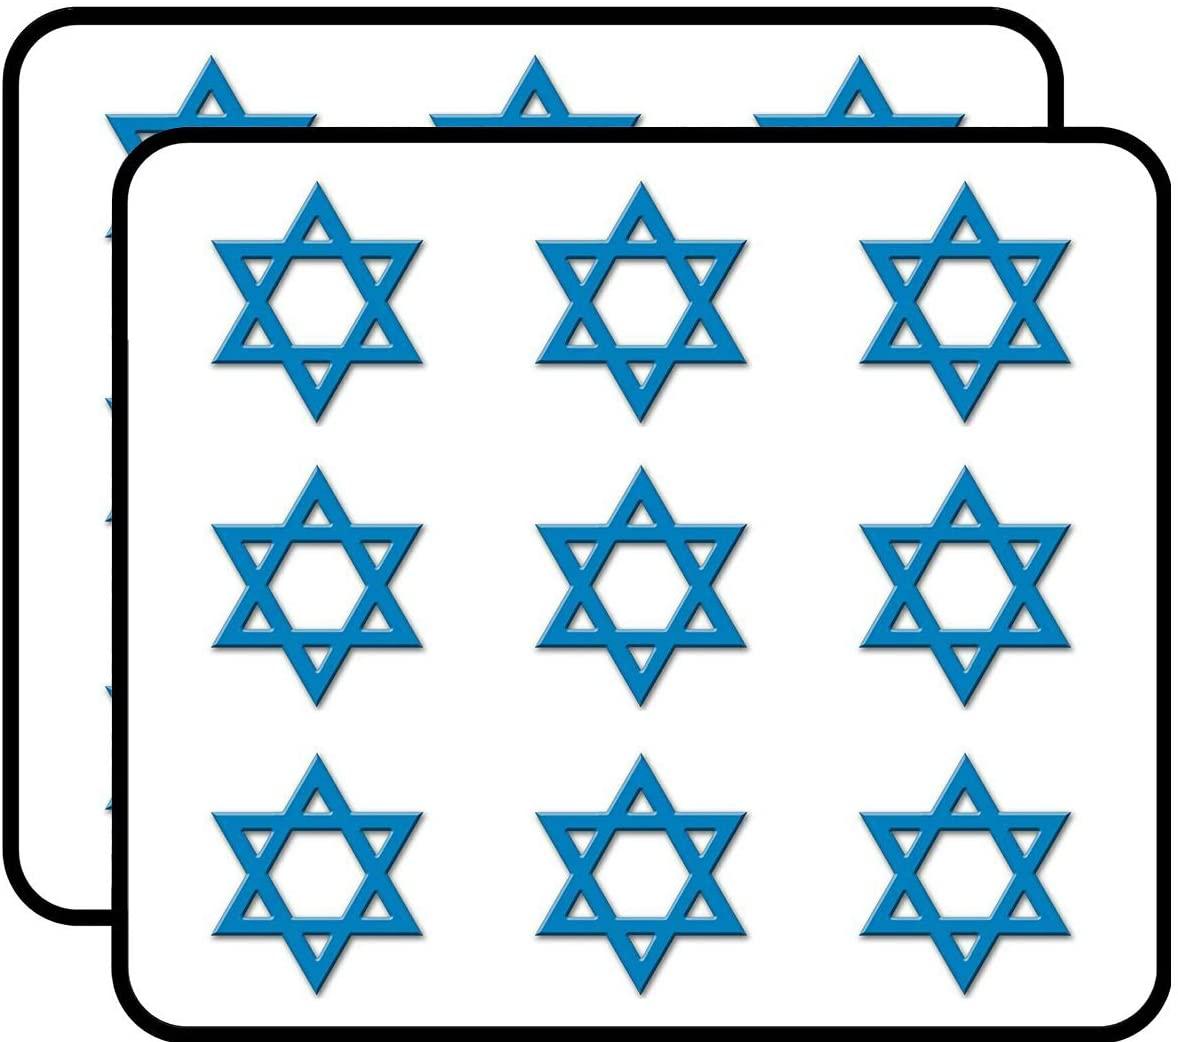 Blue 3D Look Star of David (Israel Logo Jewish Heritage Love) Sticker for Scrapbooking, Calendars, Arts, Album, Bullet Journals 2